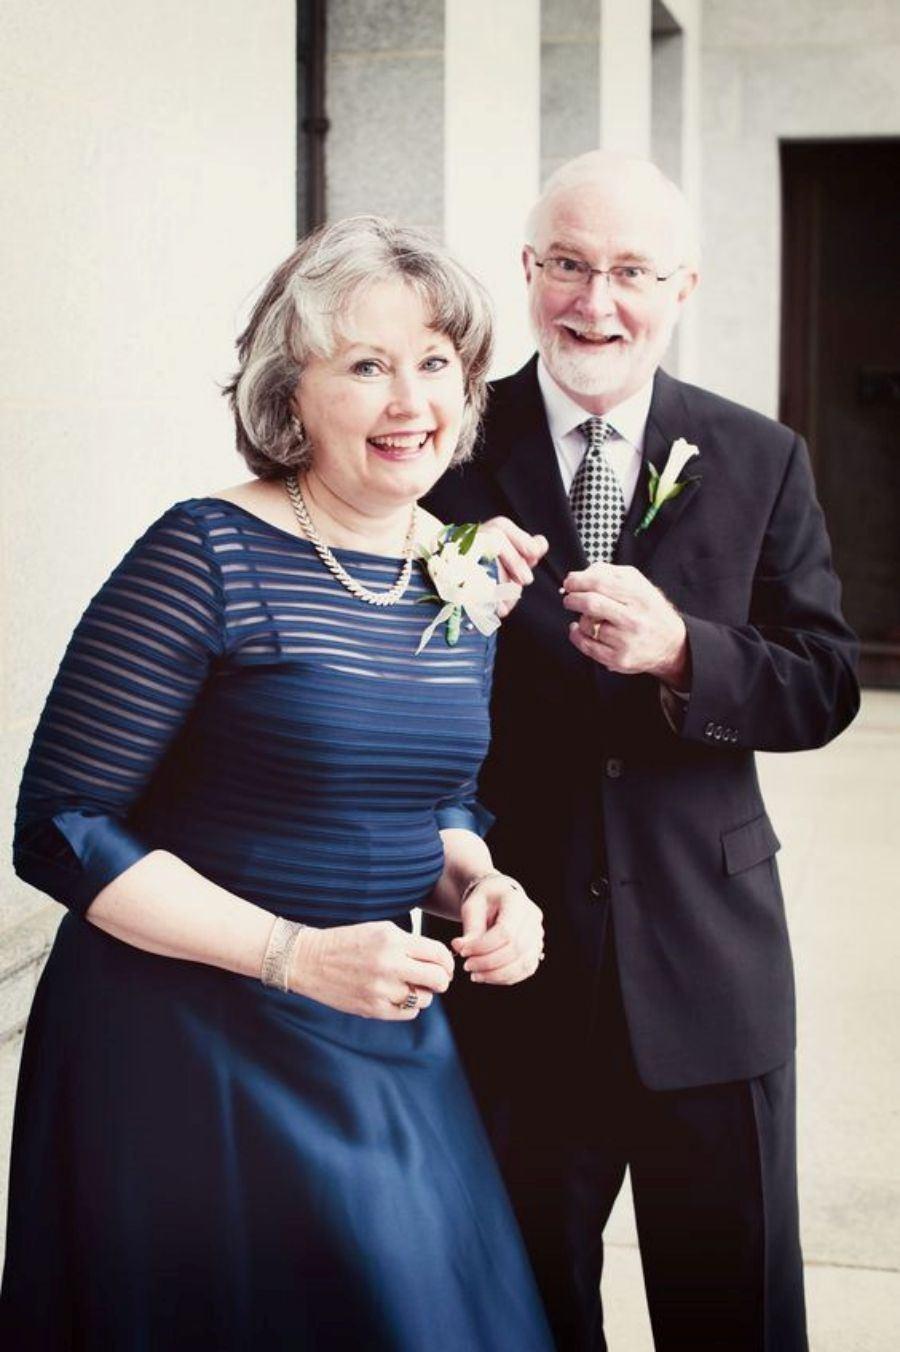 Moda Festa: Vestido curto para mãe da noiva